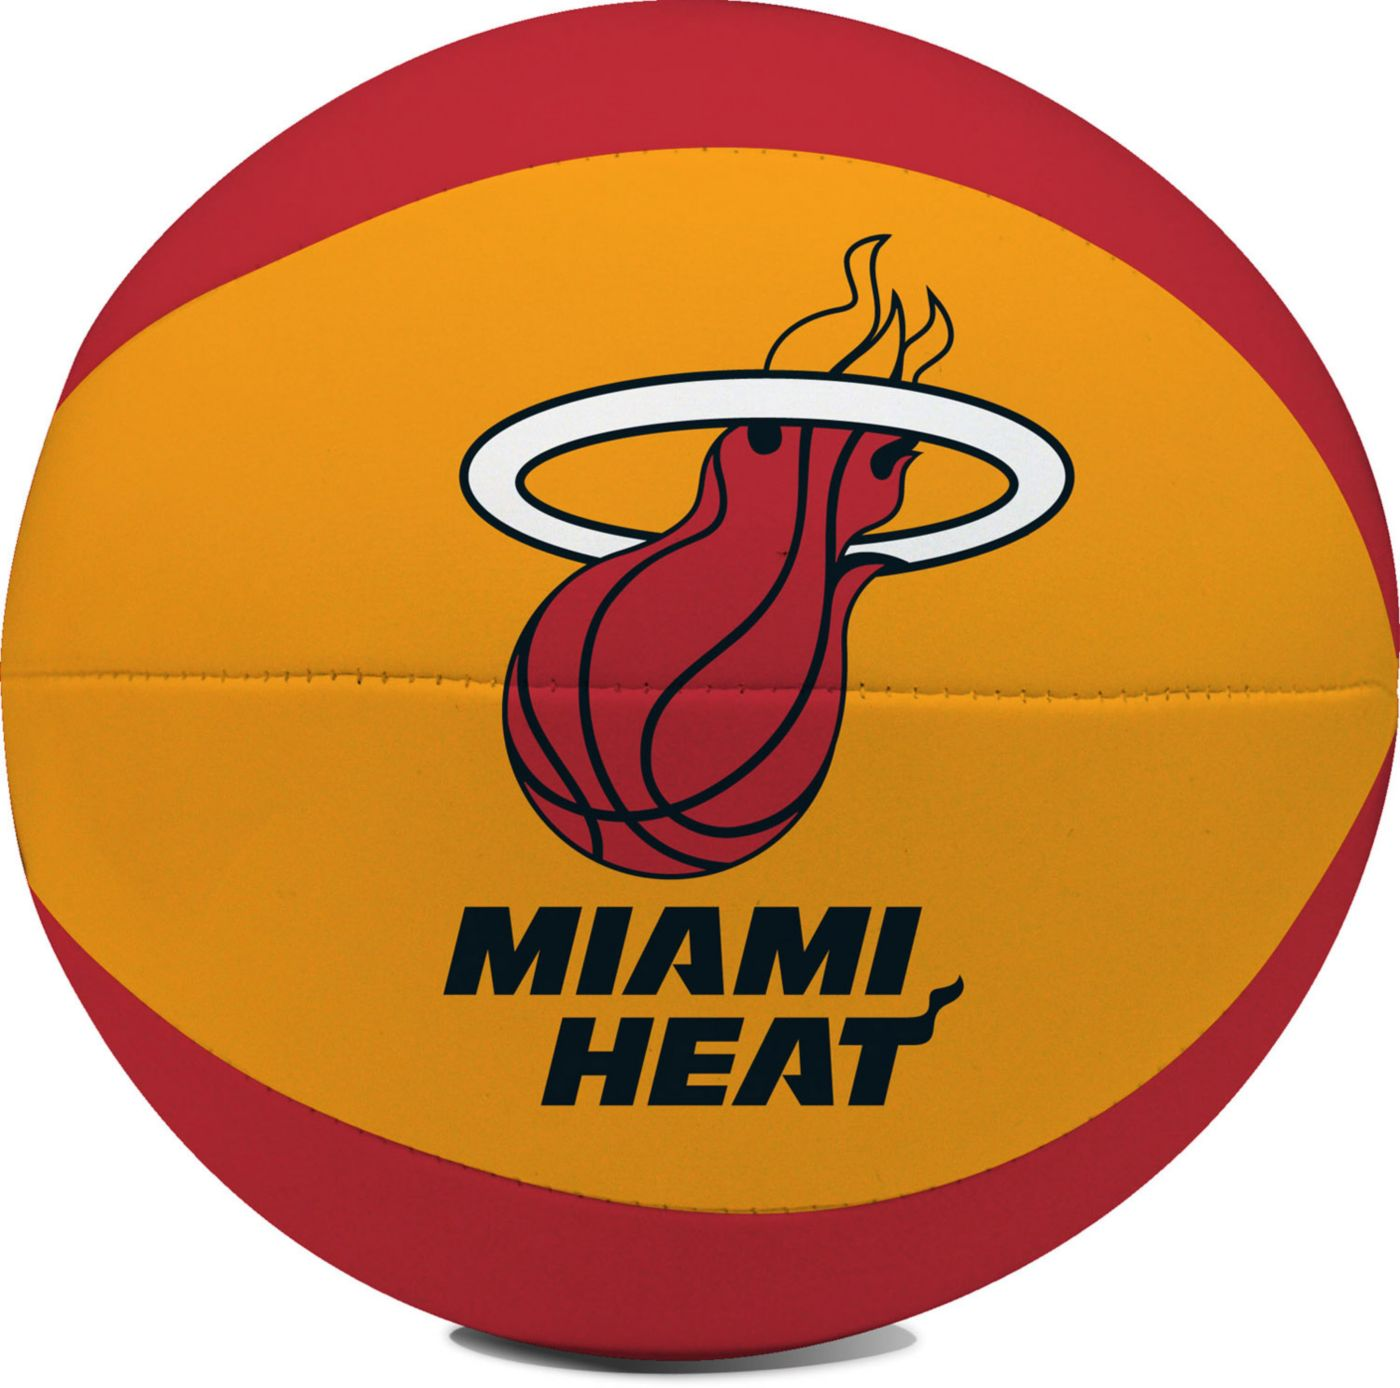 "Rawlings Miami Heat 4"" Softee Basketball"